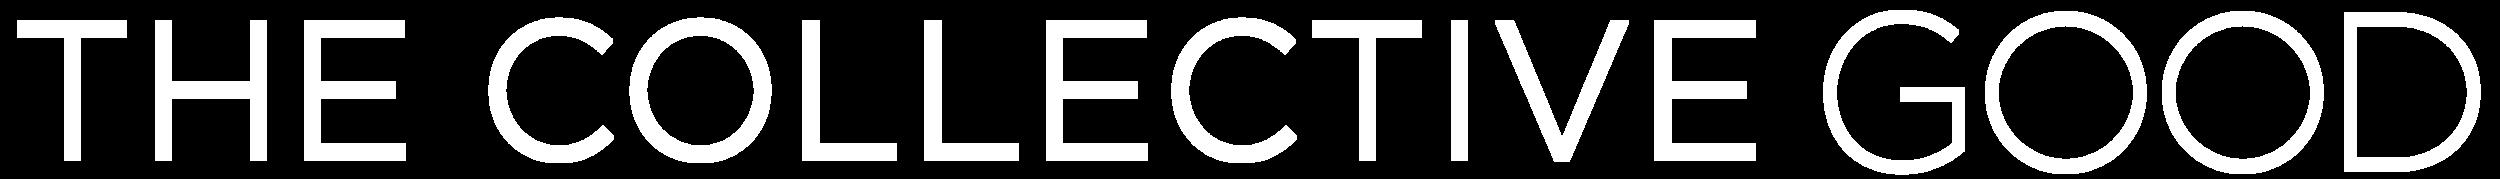 TCG__Sub_Logo_White.png